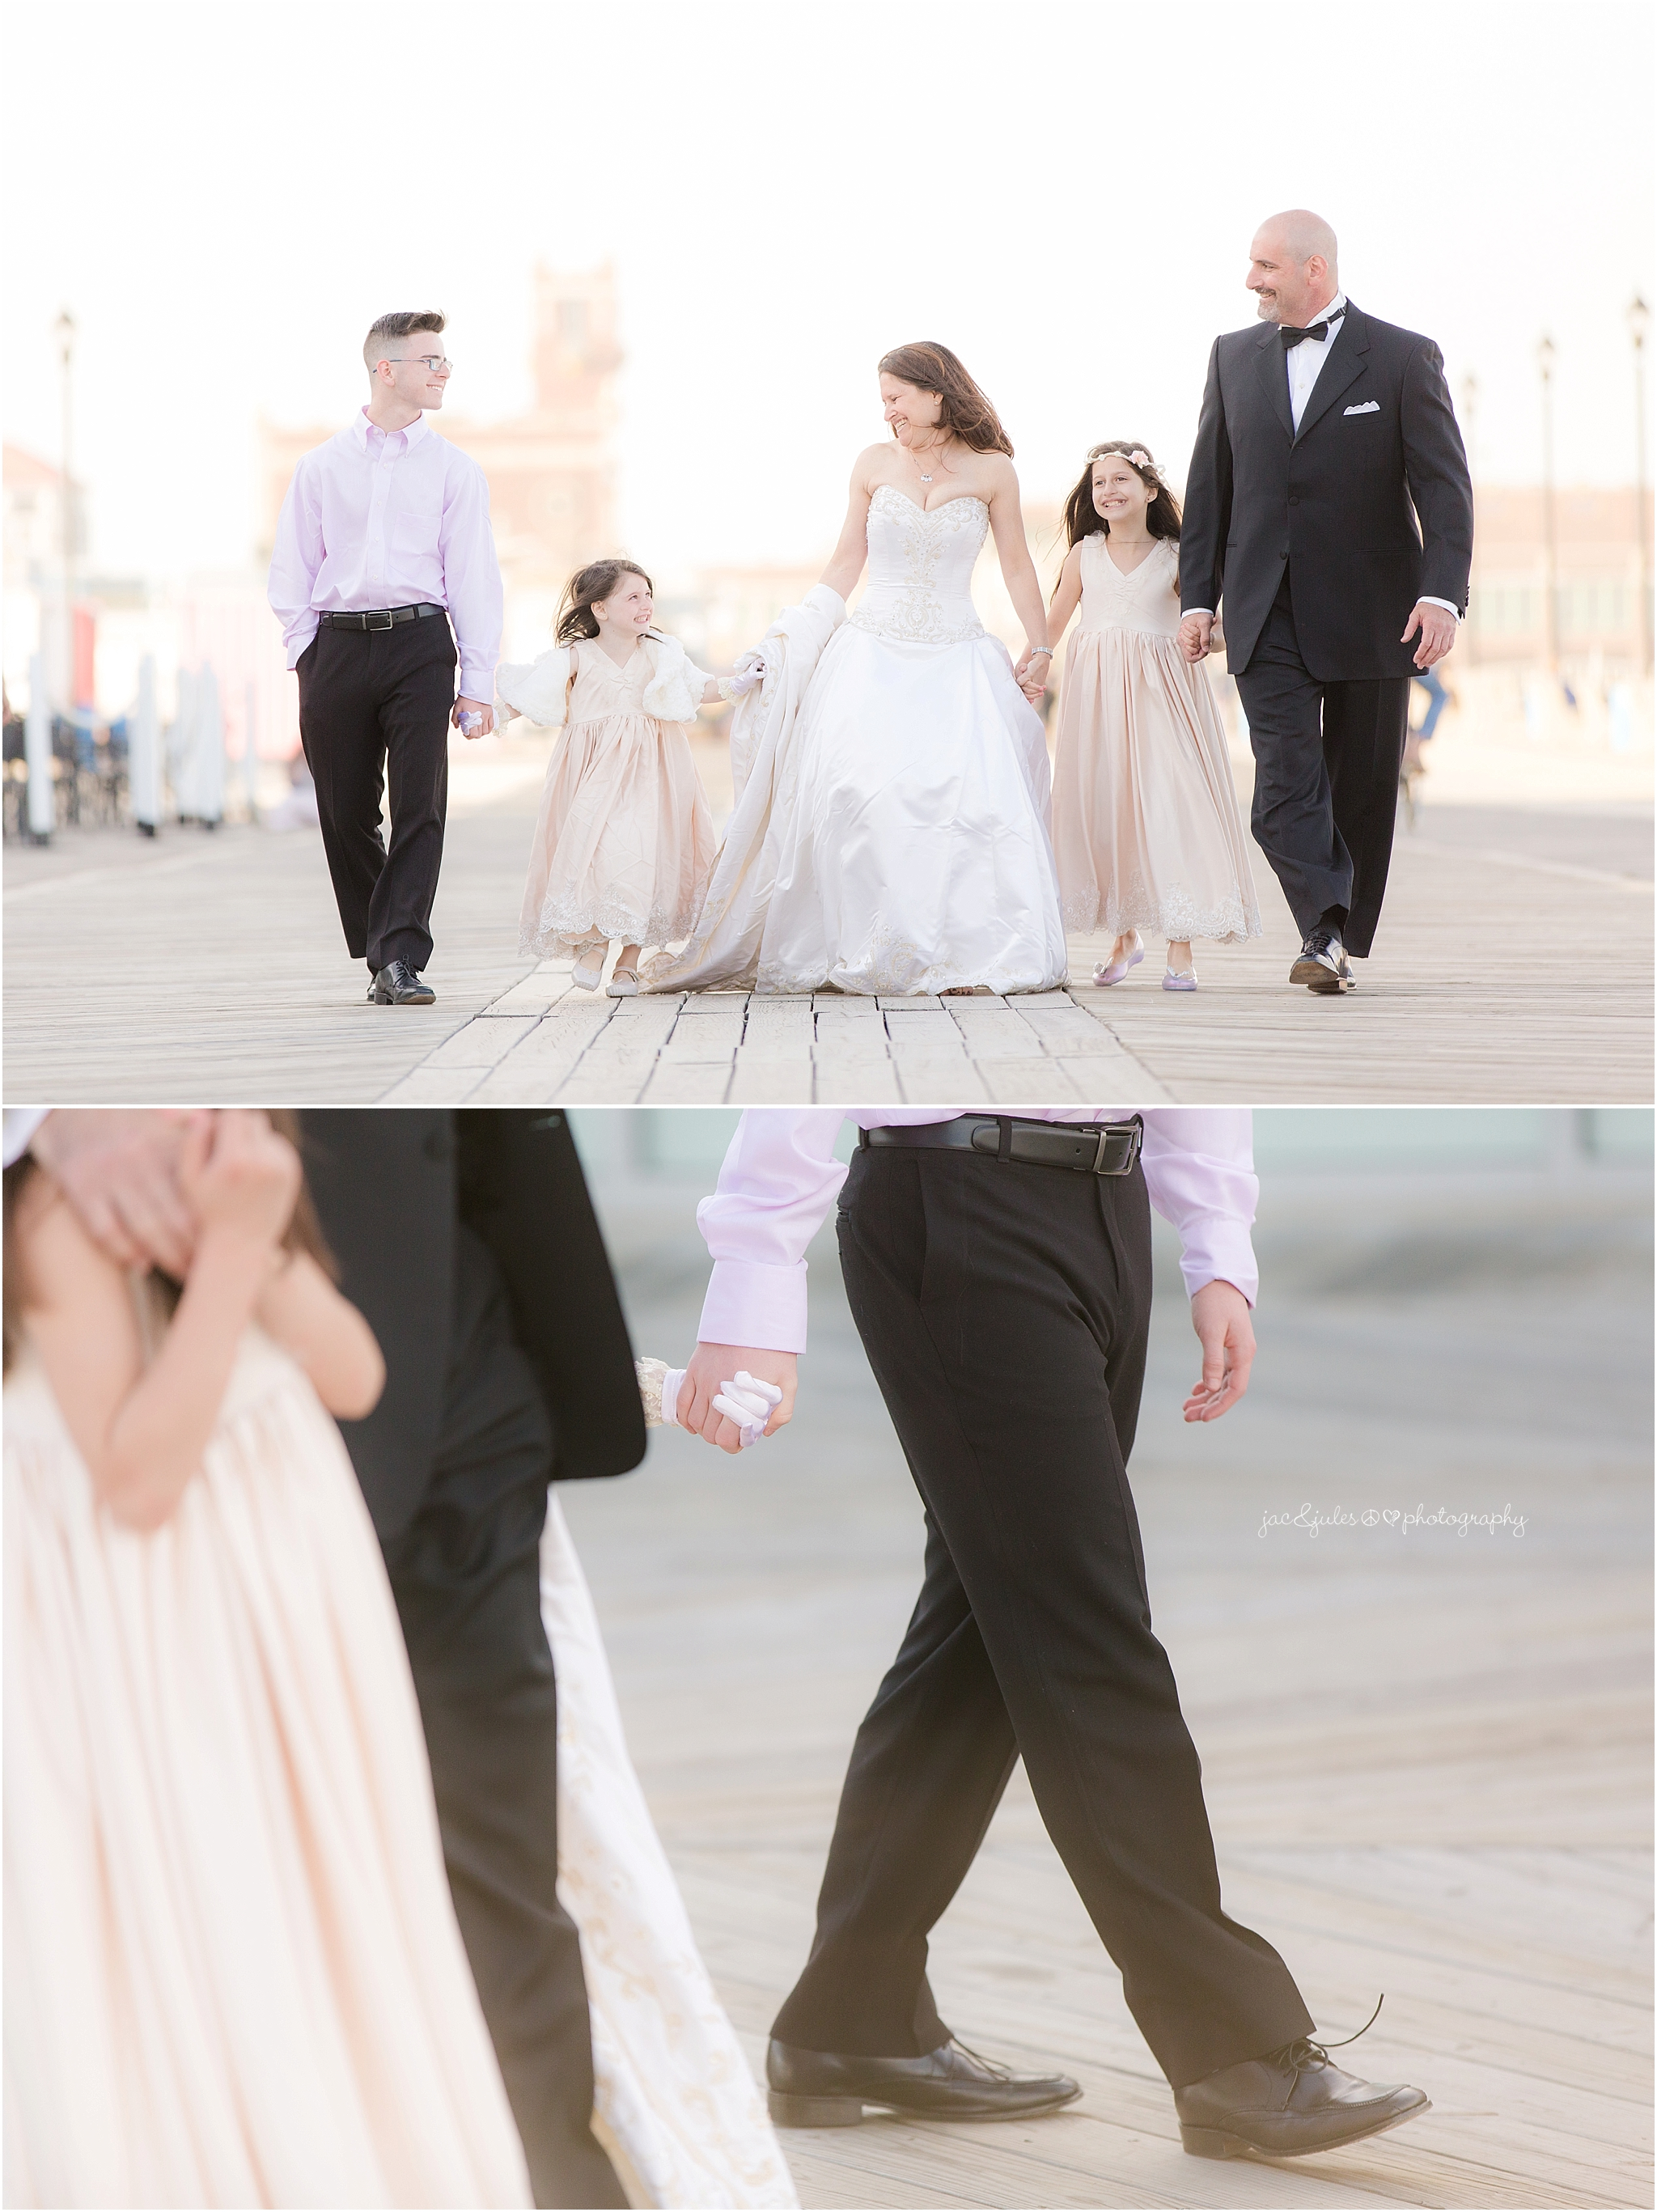 jacnjules photographs wedding anniversary in Asbury Park NJ